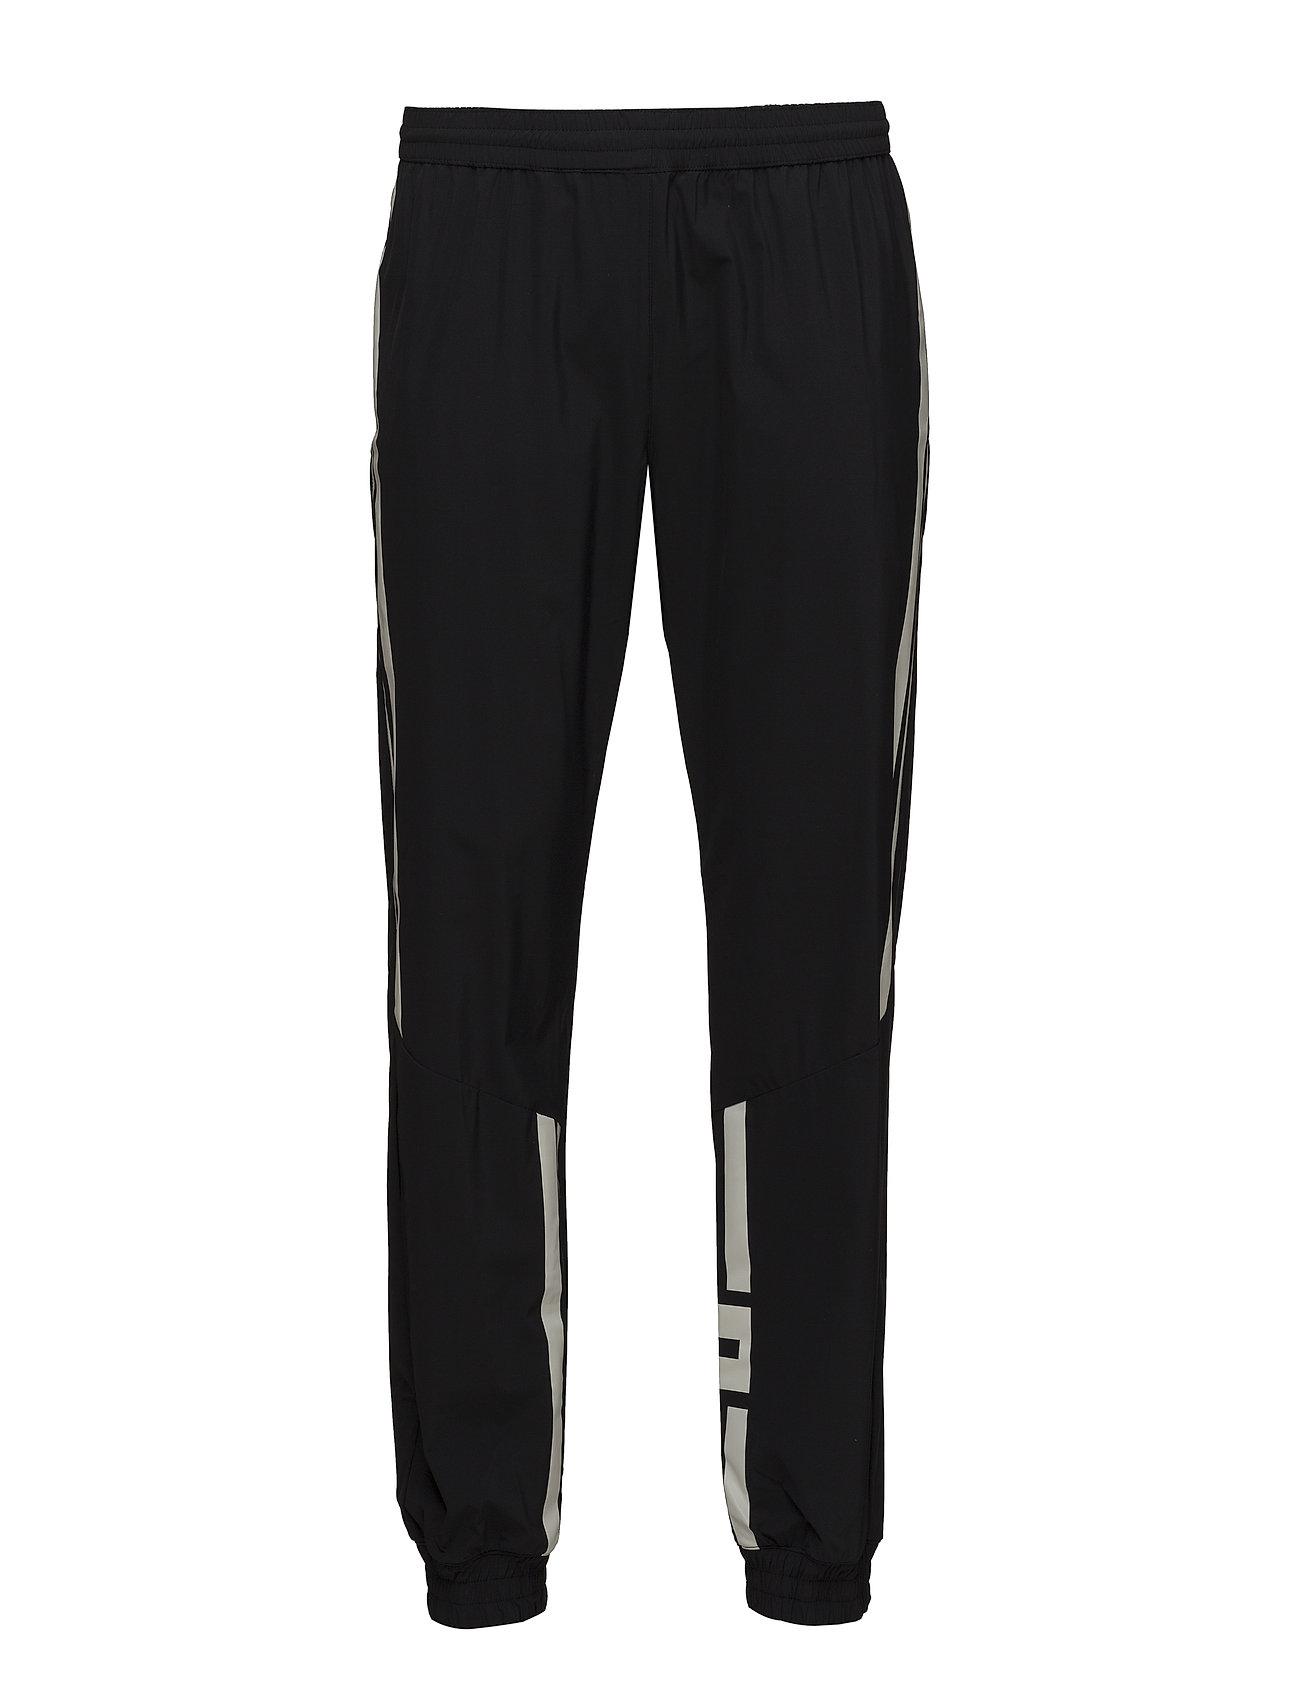 J. Lindeberg M Steely Retro Pant - BLACK